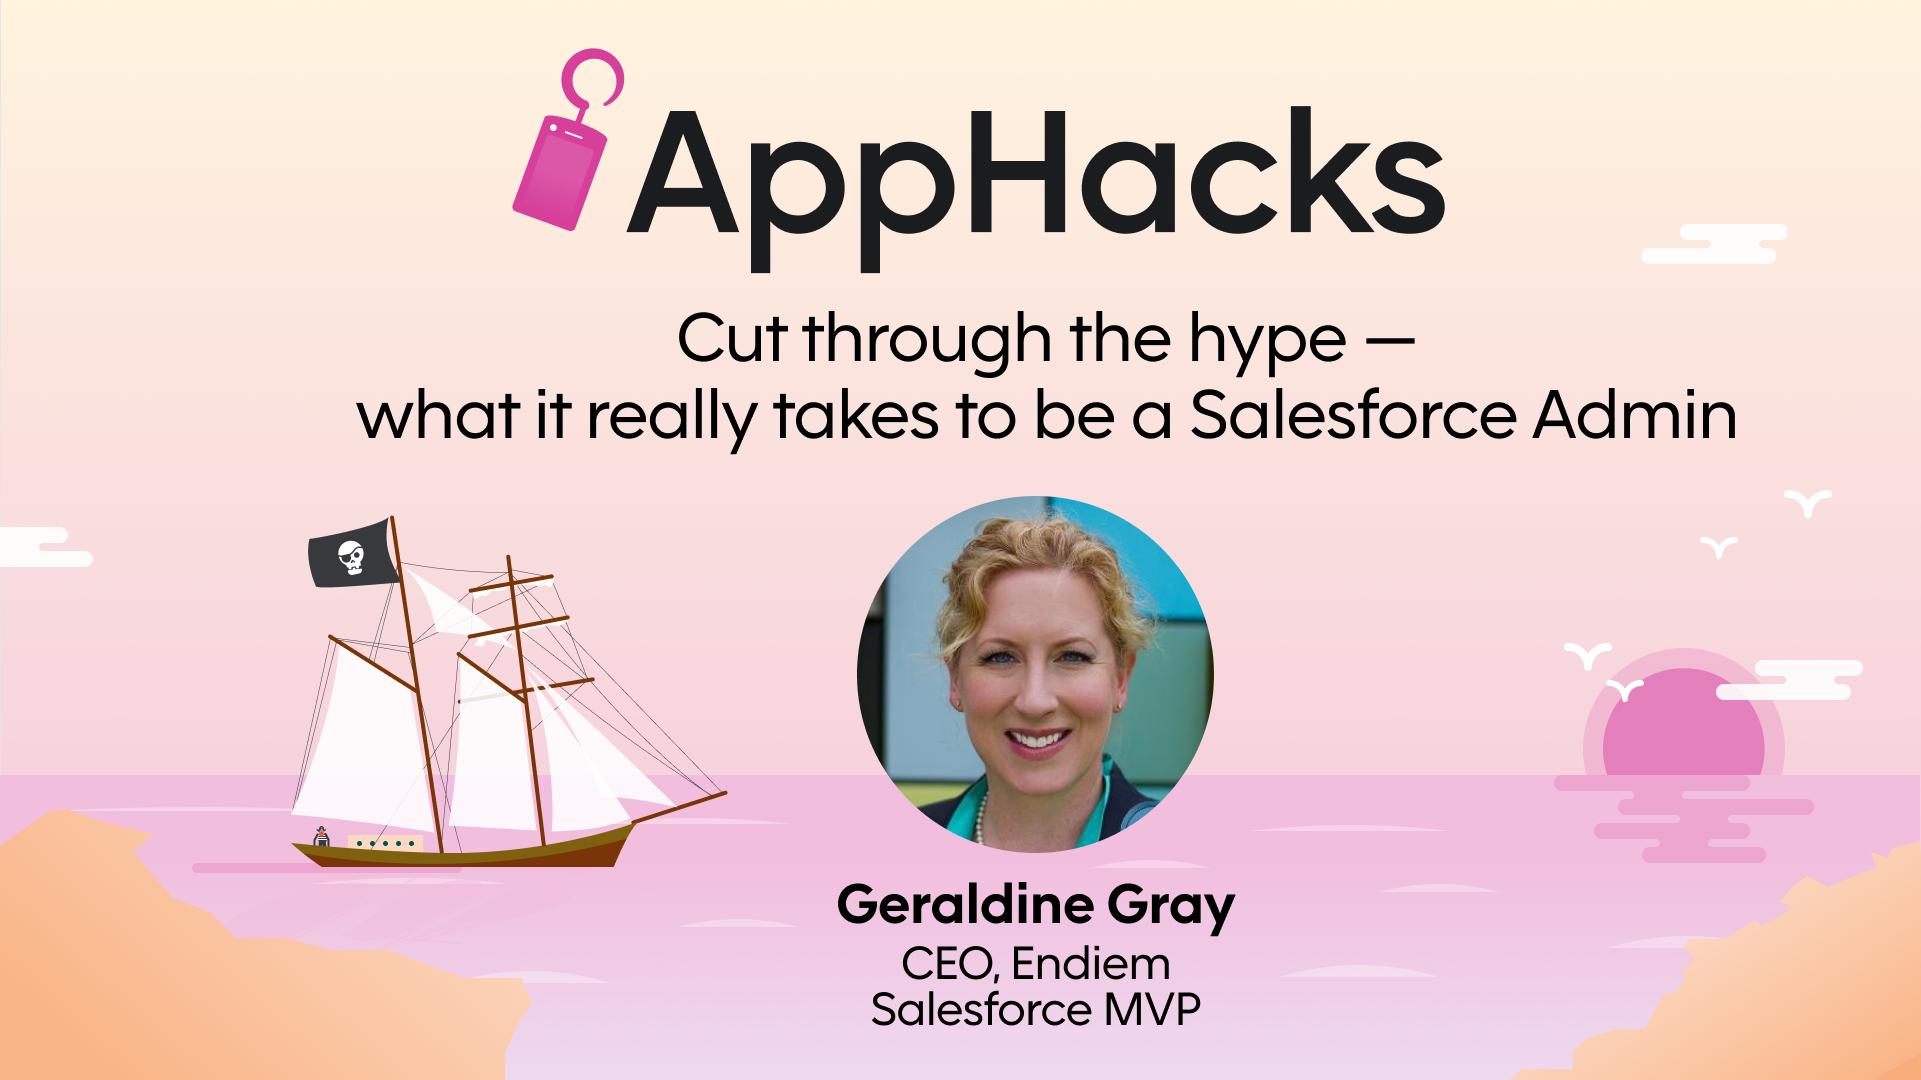 Cutting through the hype with Geraldine Gray, CEO, Endiem | Skuid AppHacks